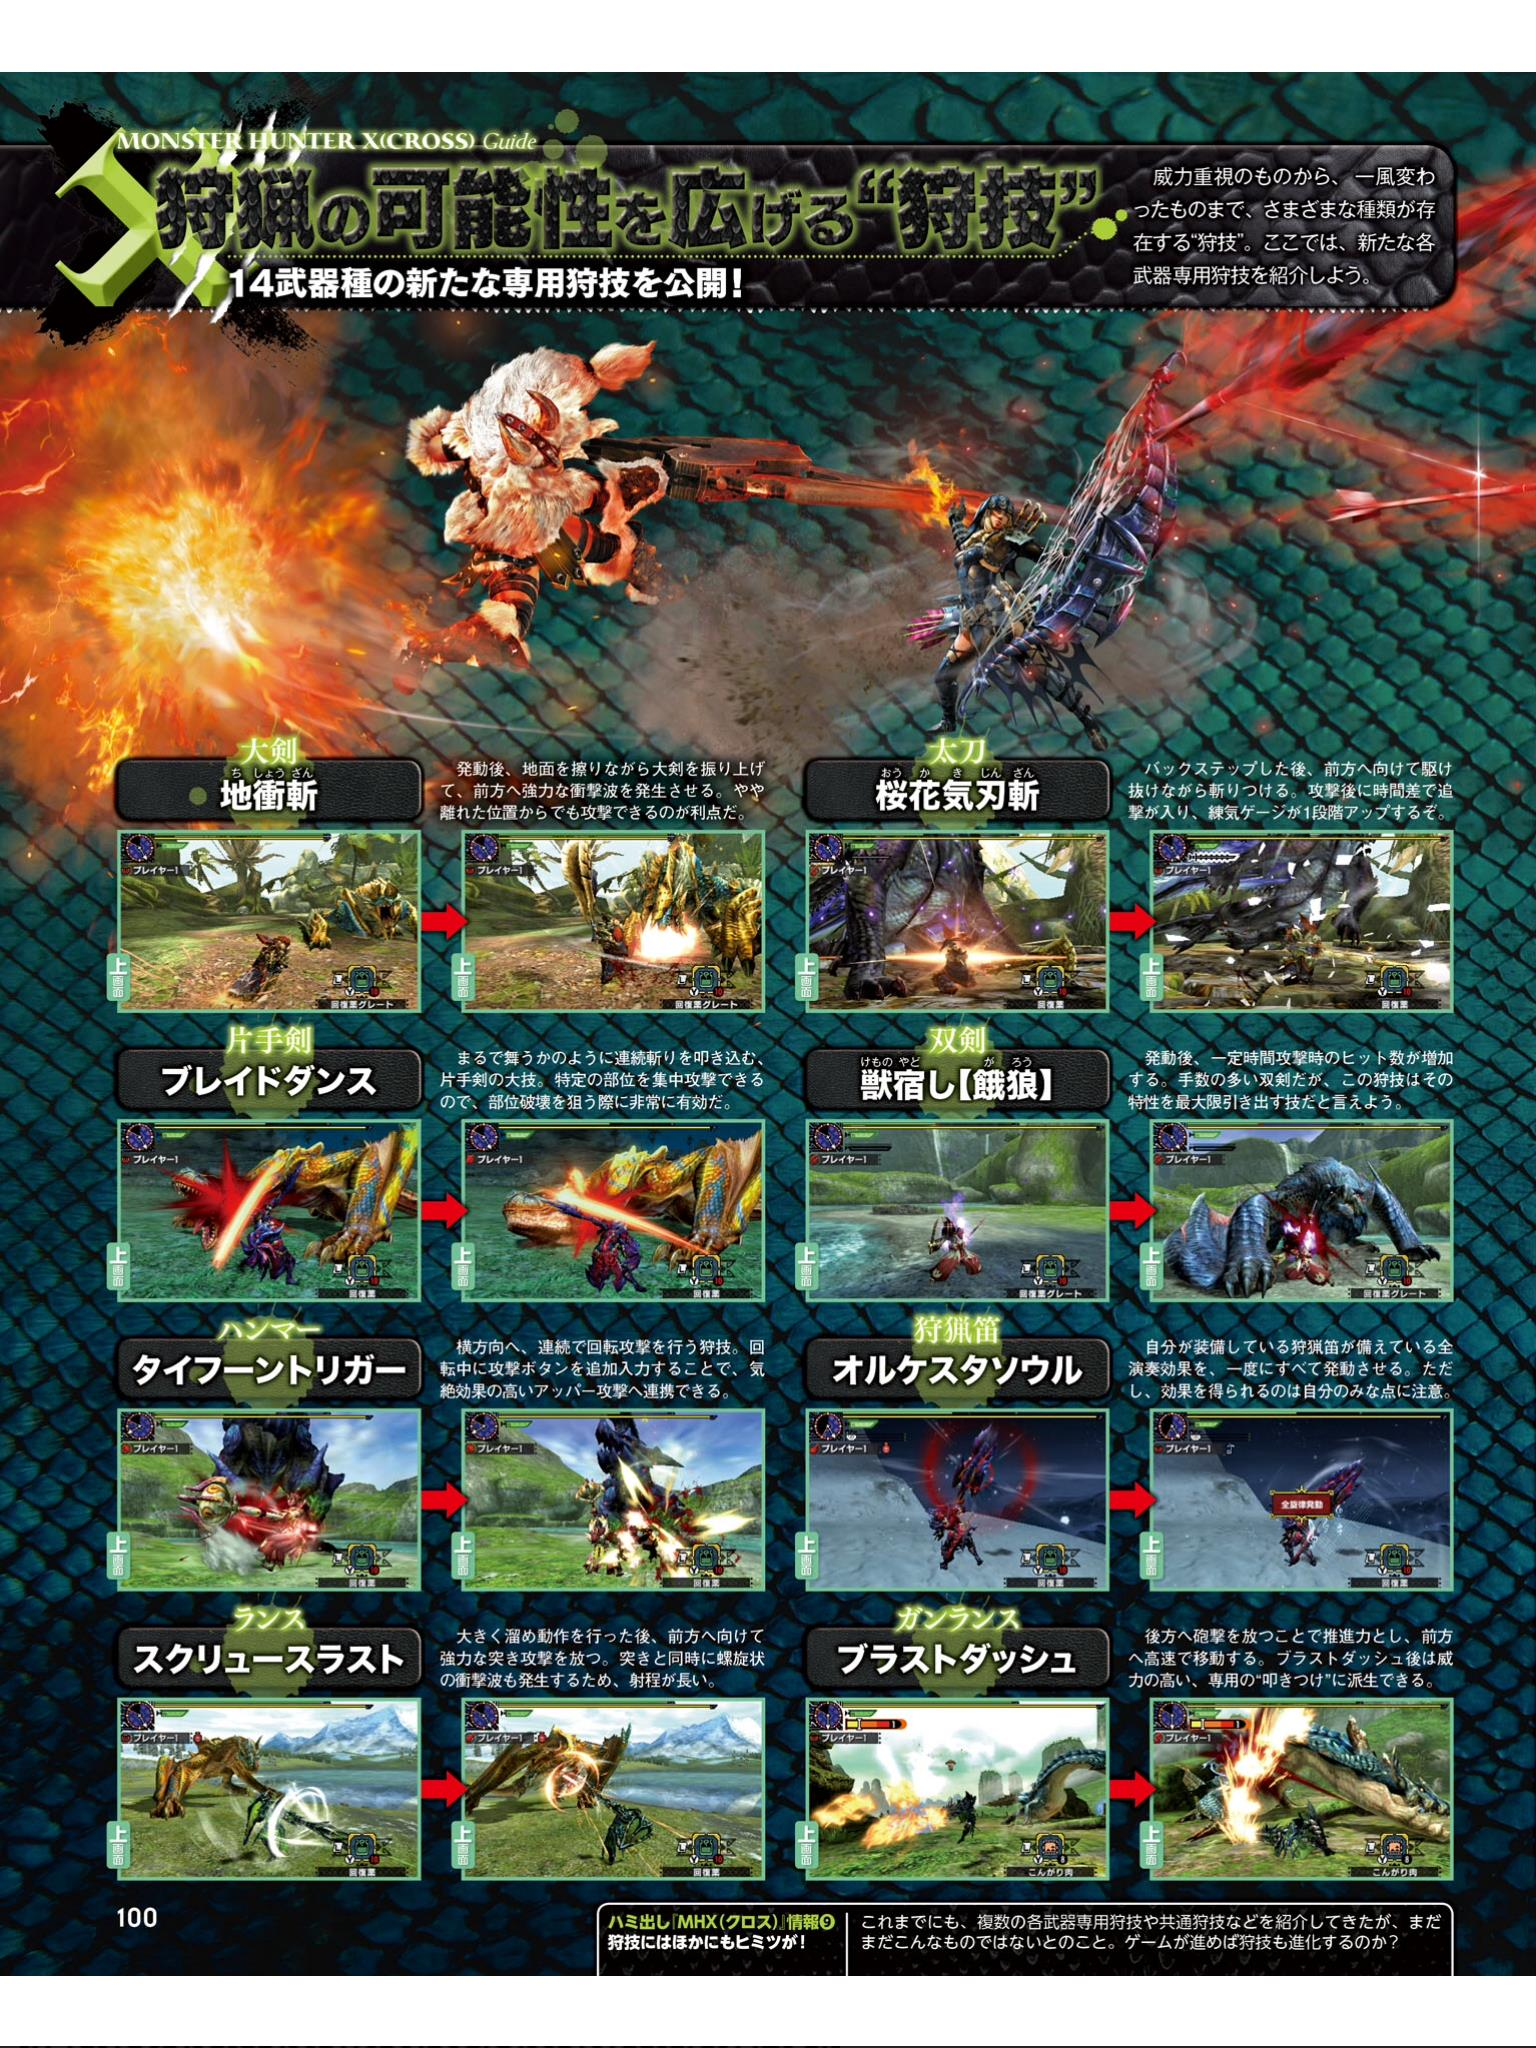 scans roundup animal crossing amiibo festival monster hunter x